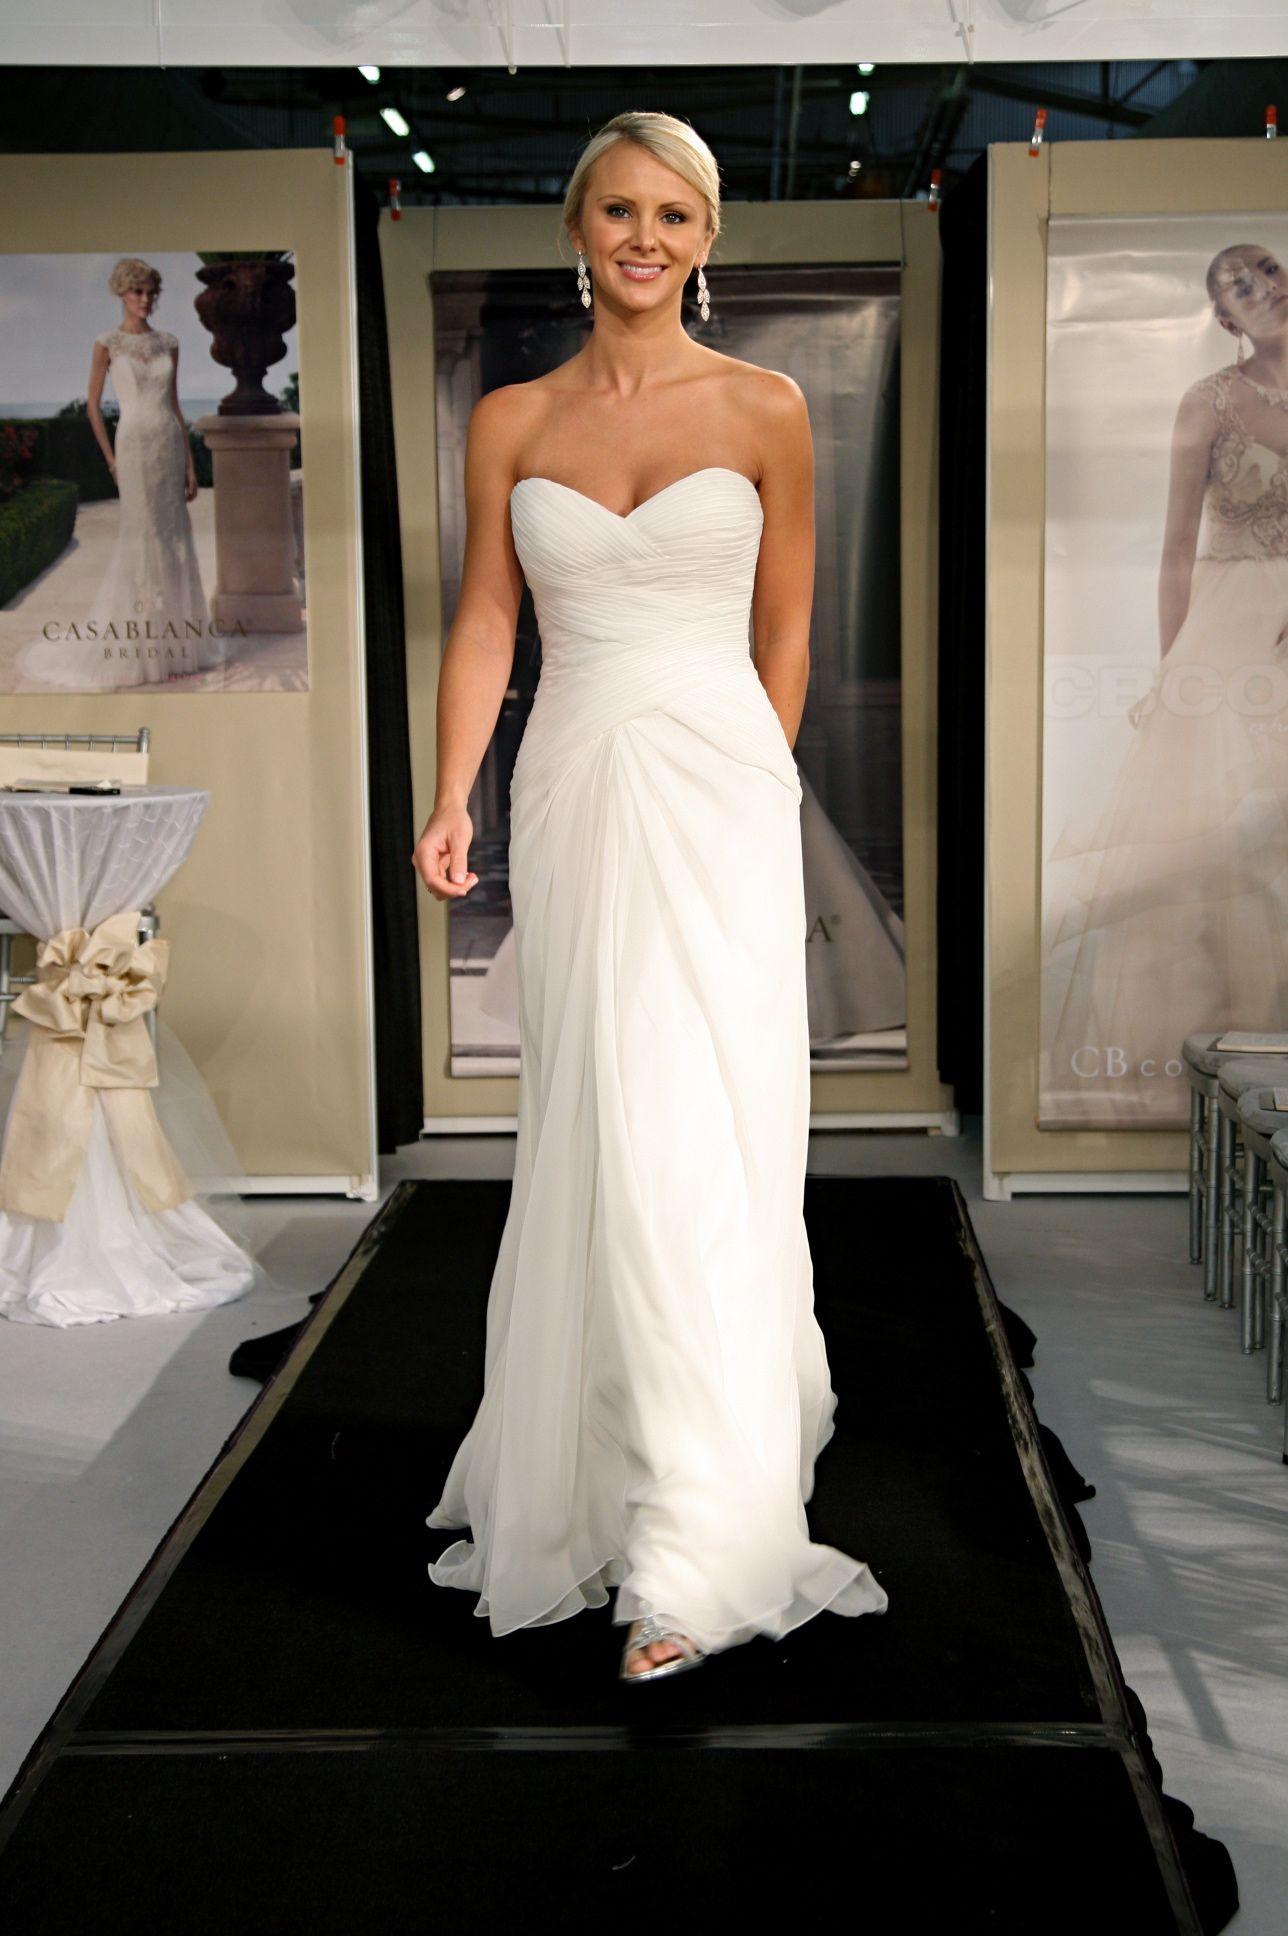 Top 12 Beach Wedding Dresses, Fall 2014 Beach wedding